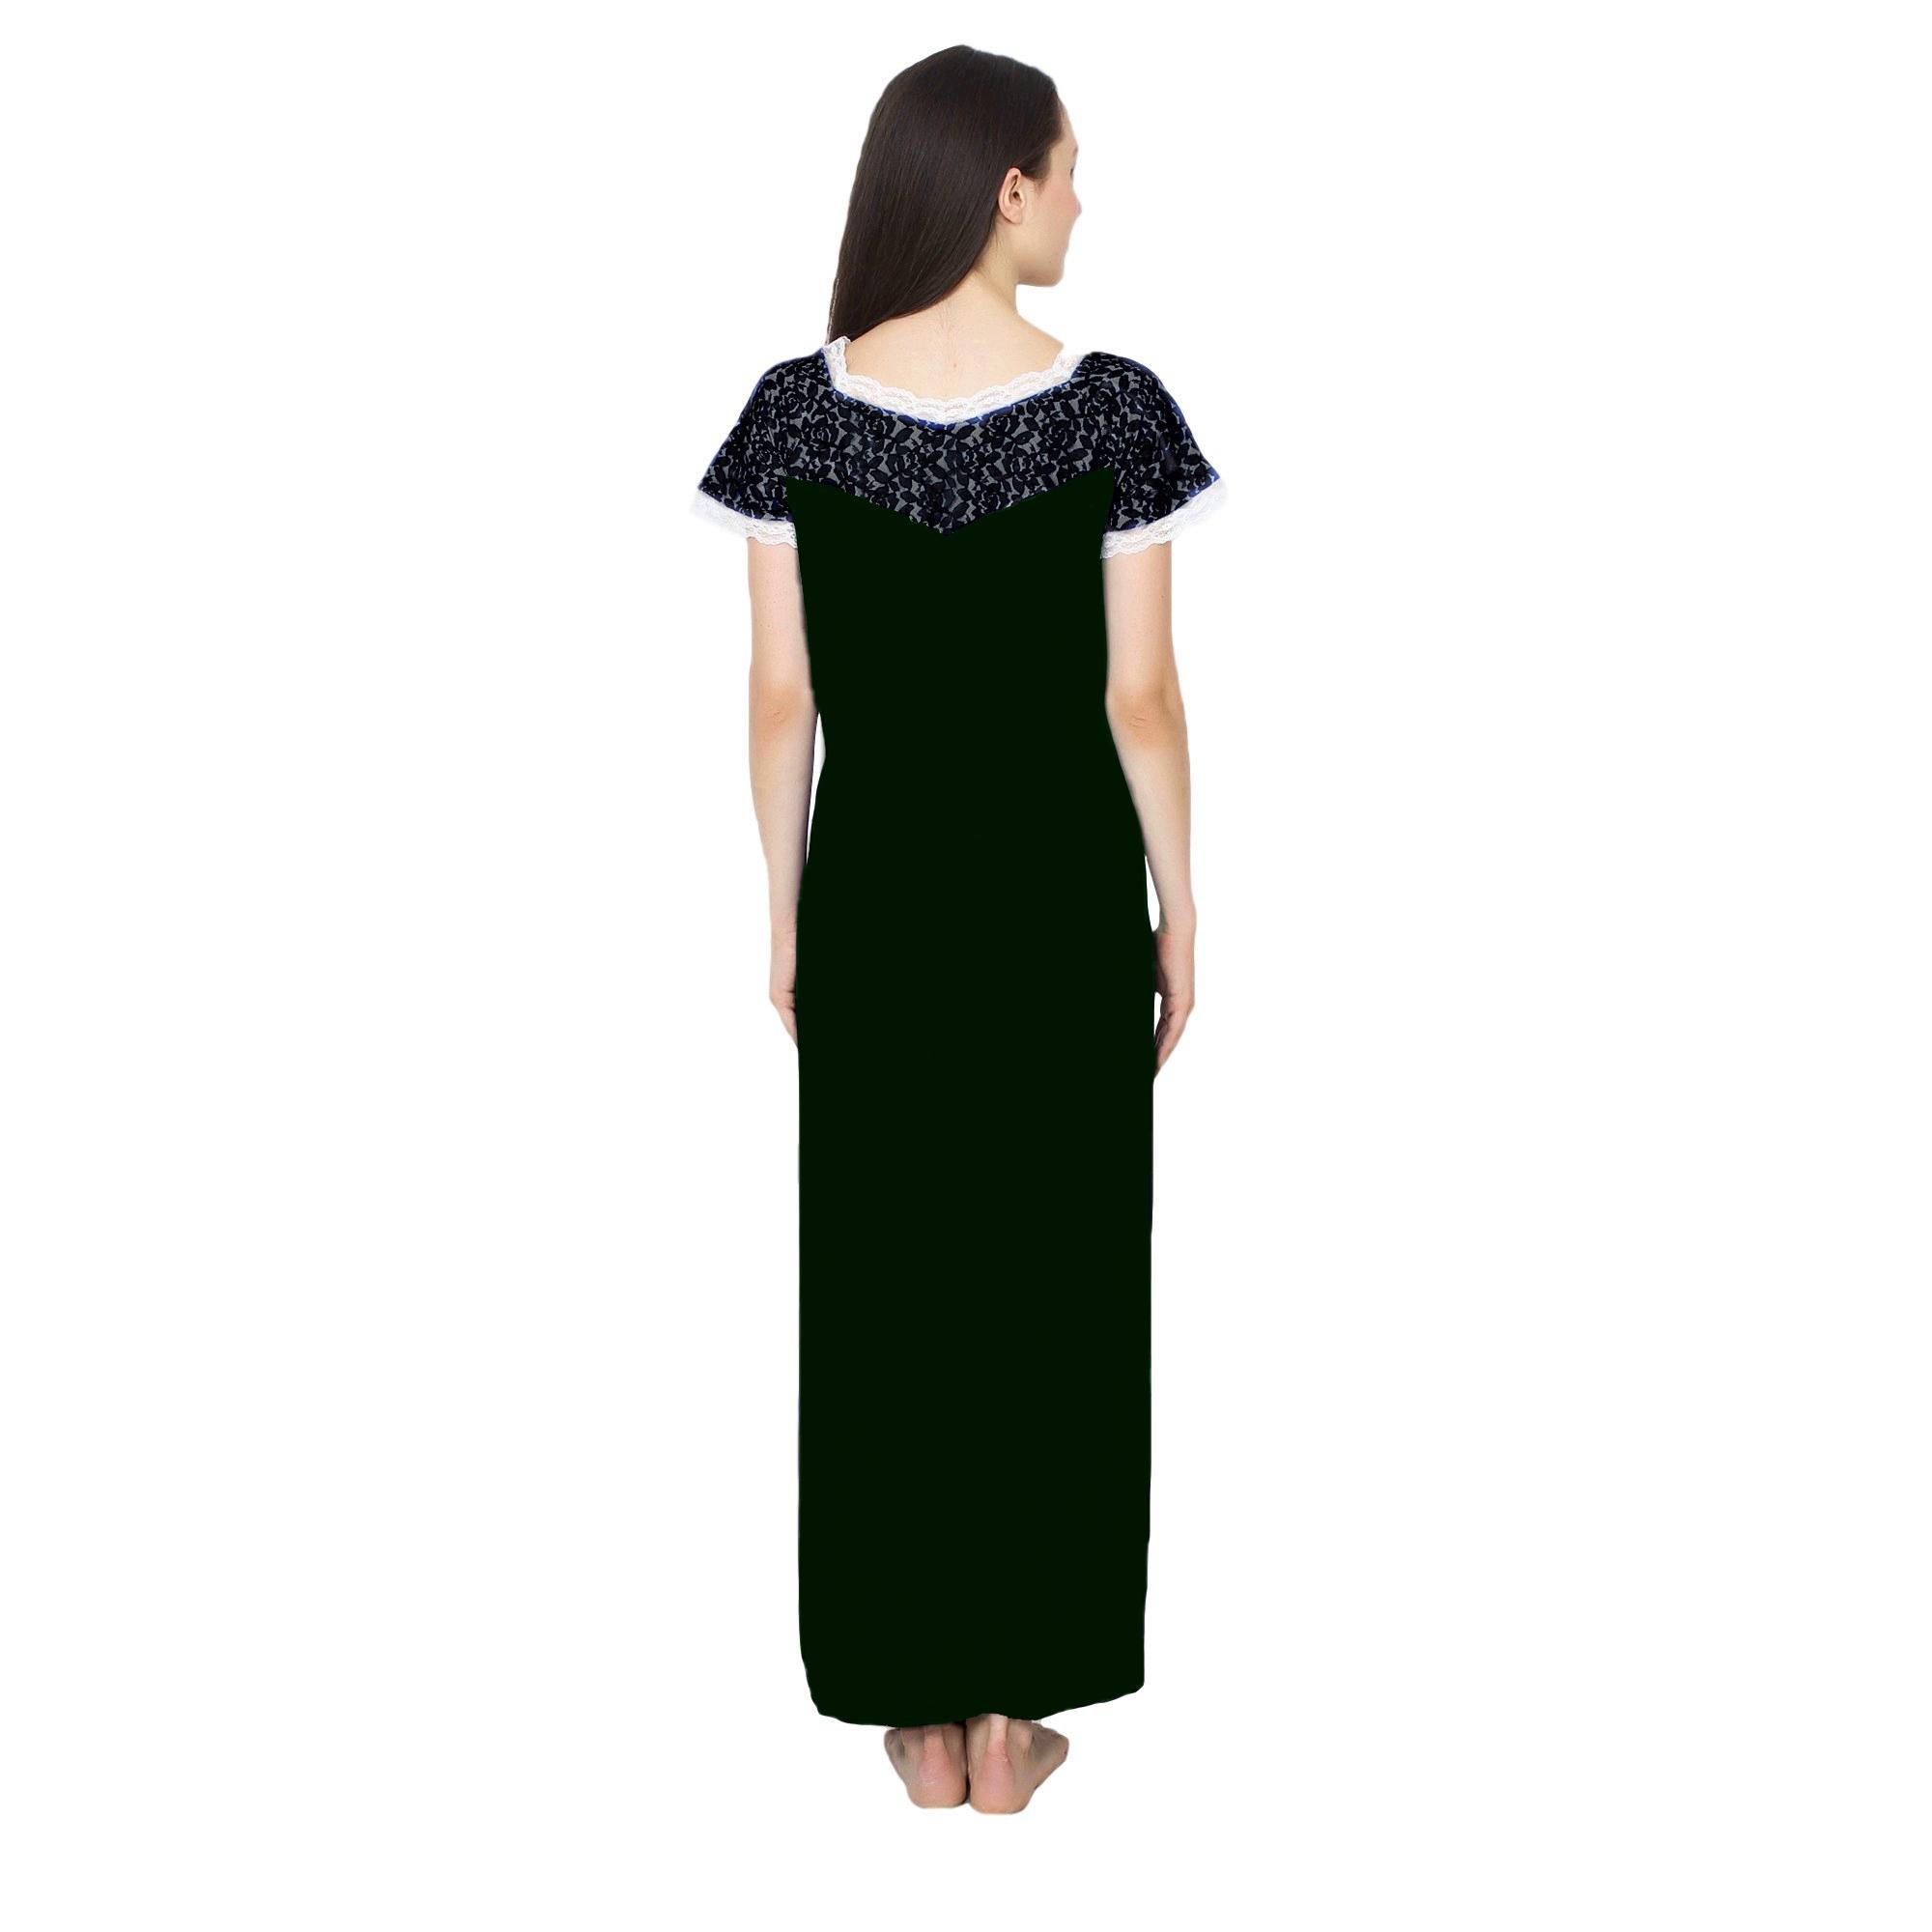 Lace Blouson A-Line Maxi in Black:Bottle Green